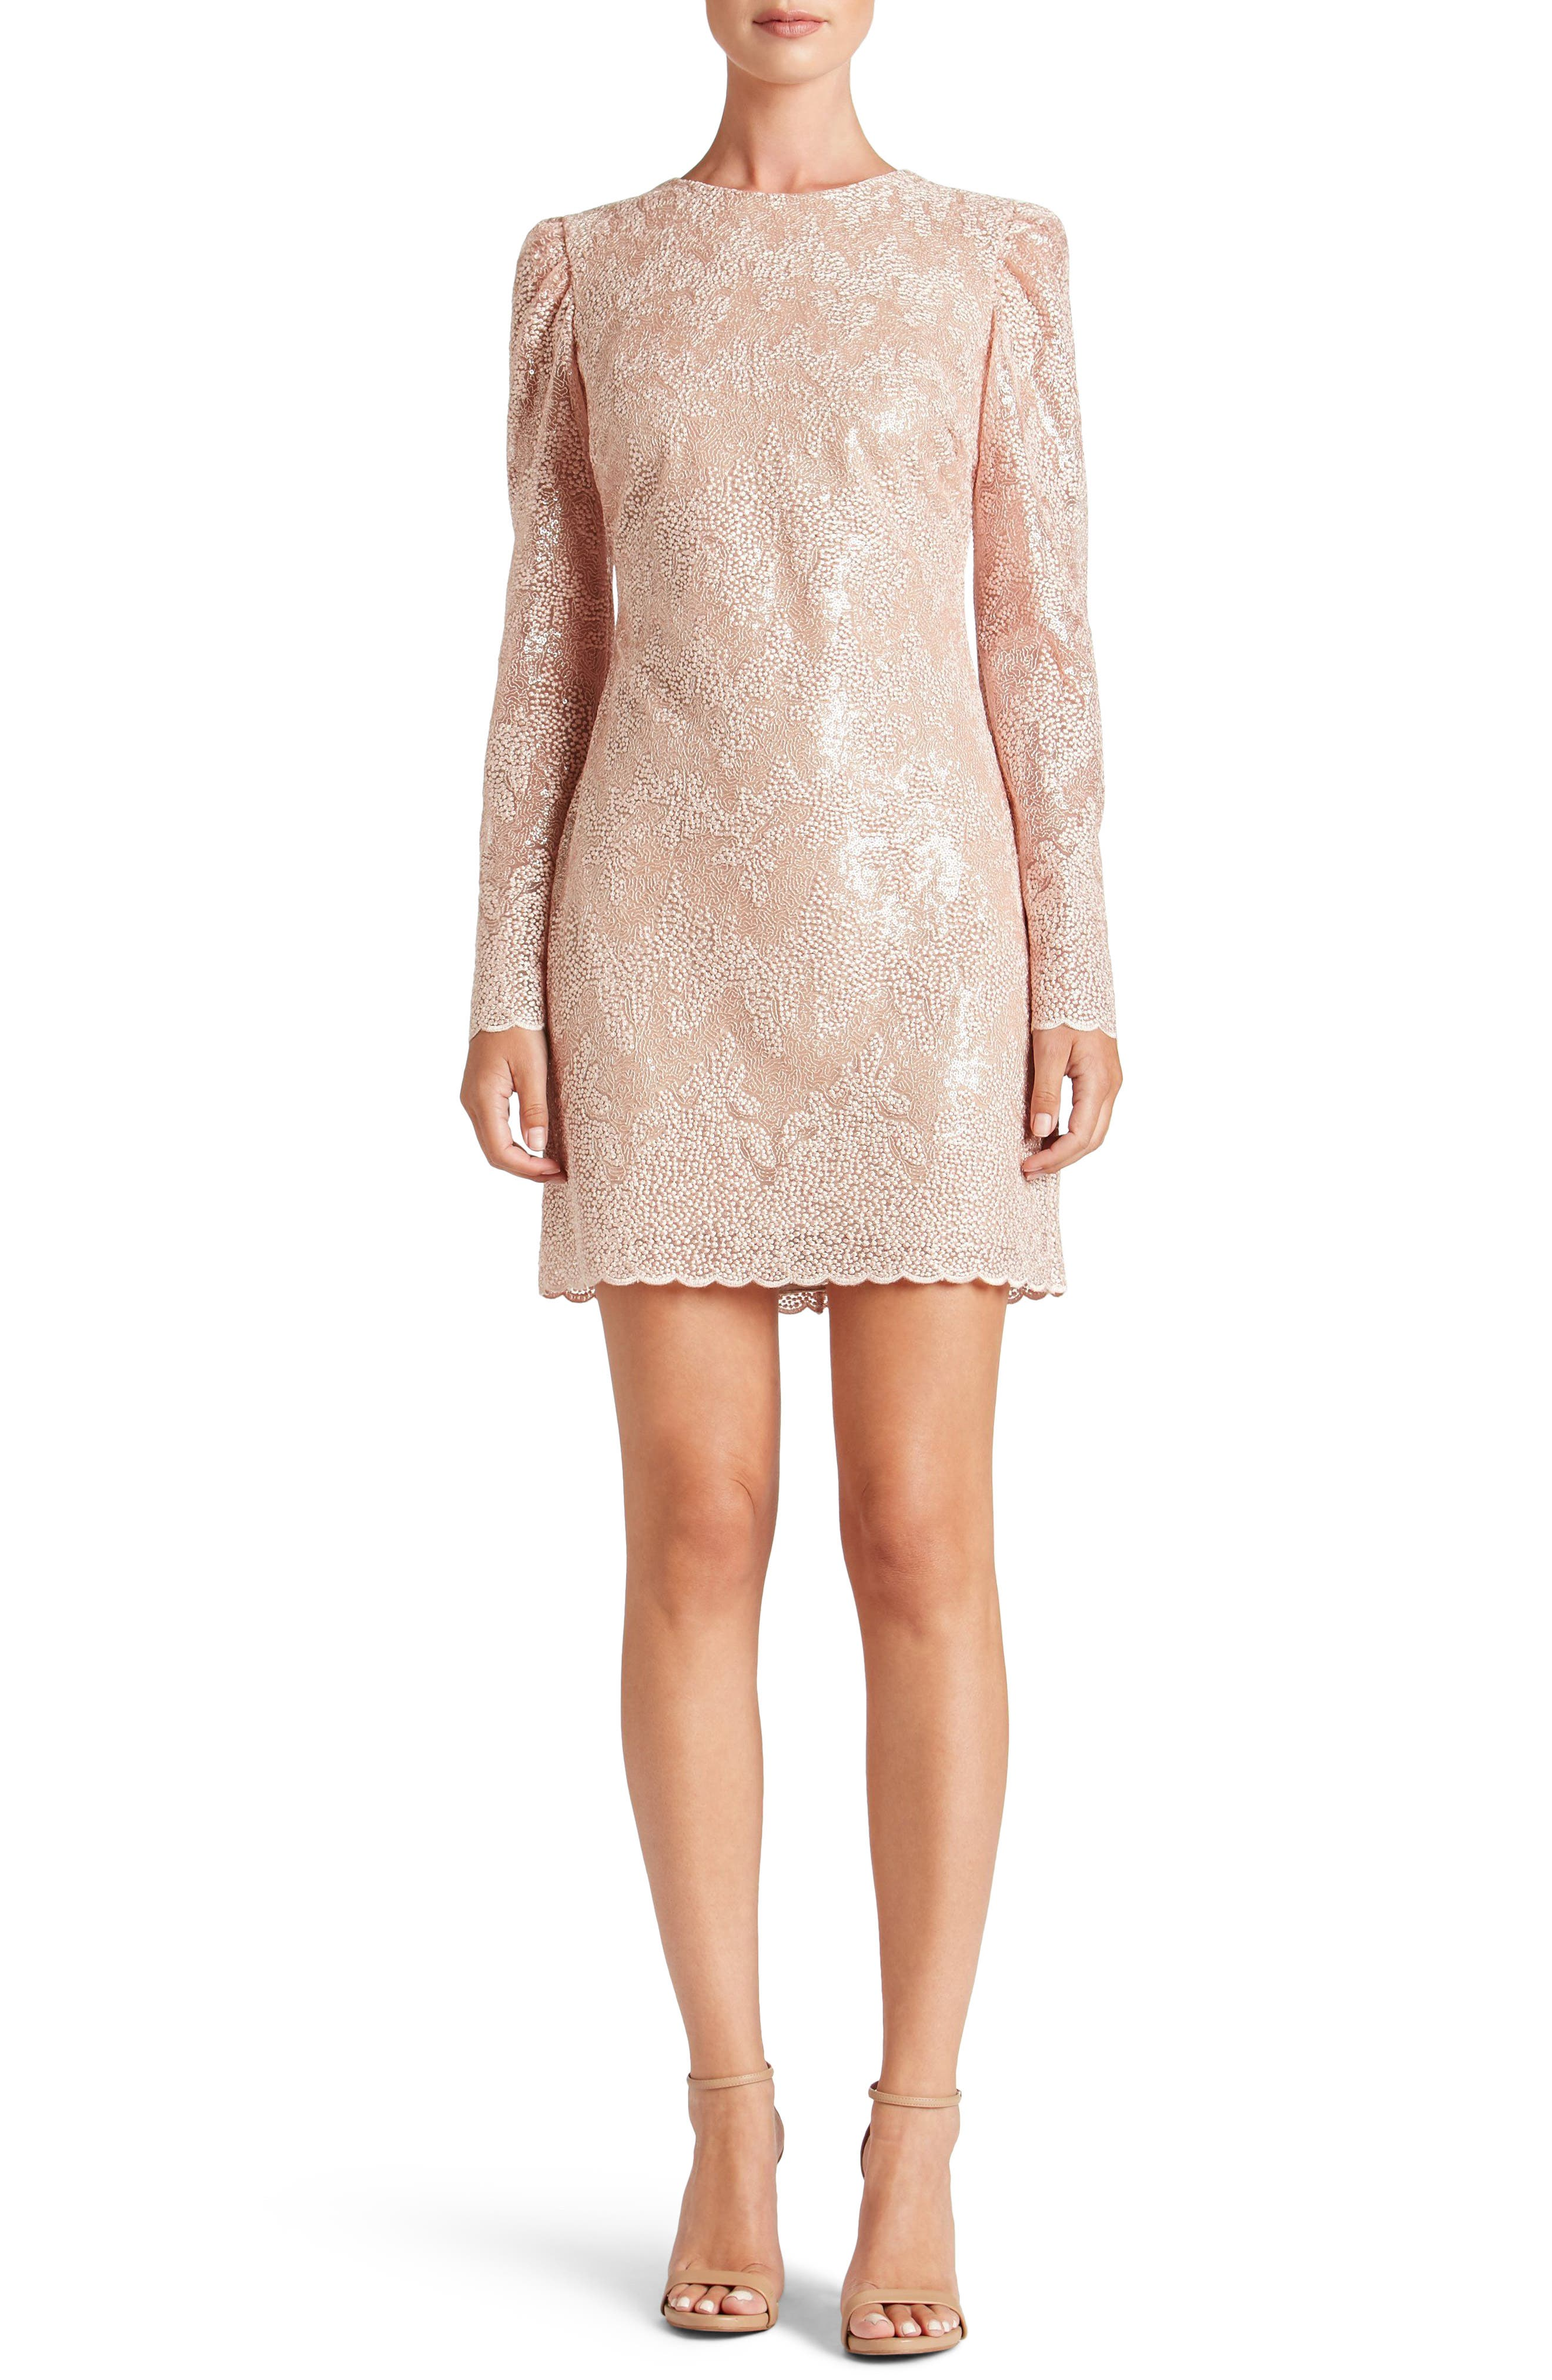 Aubry Sequin Embellished Shift Dress,                             Alternate thumbnail 5, color,                             686